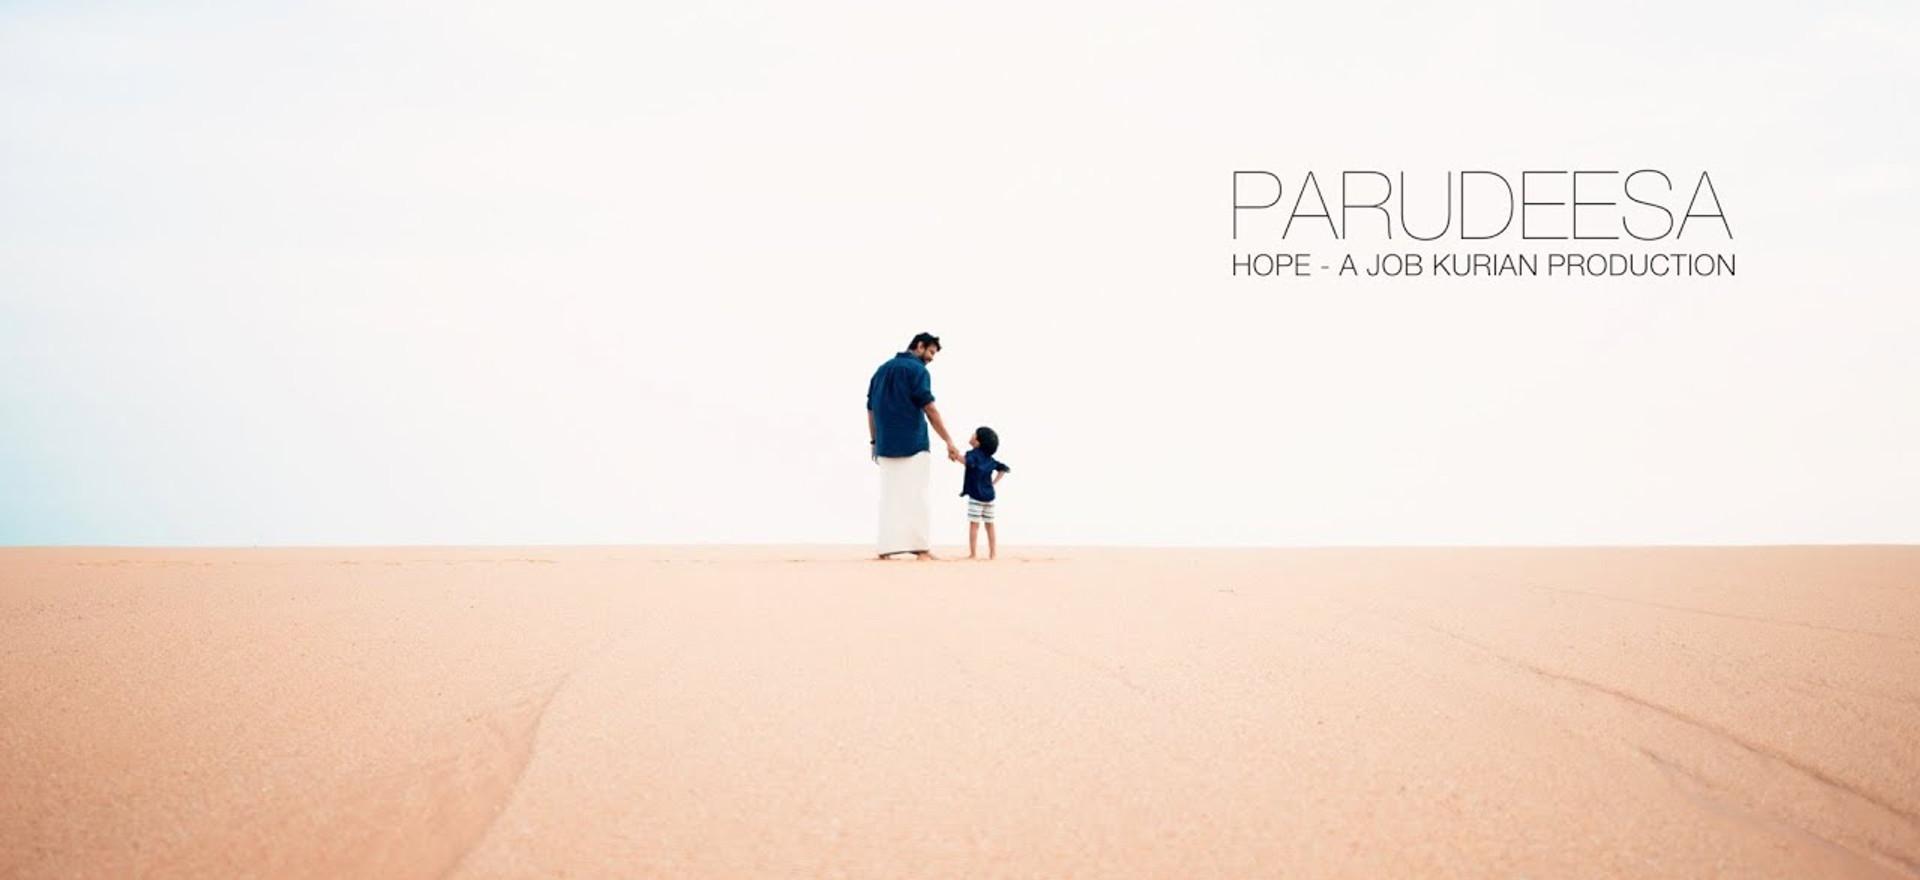 Job Kurian - Parudeesa - Excerpt from the Songs of Hope - LIVE